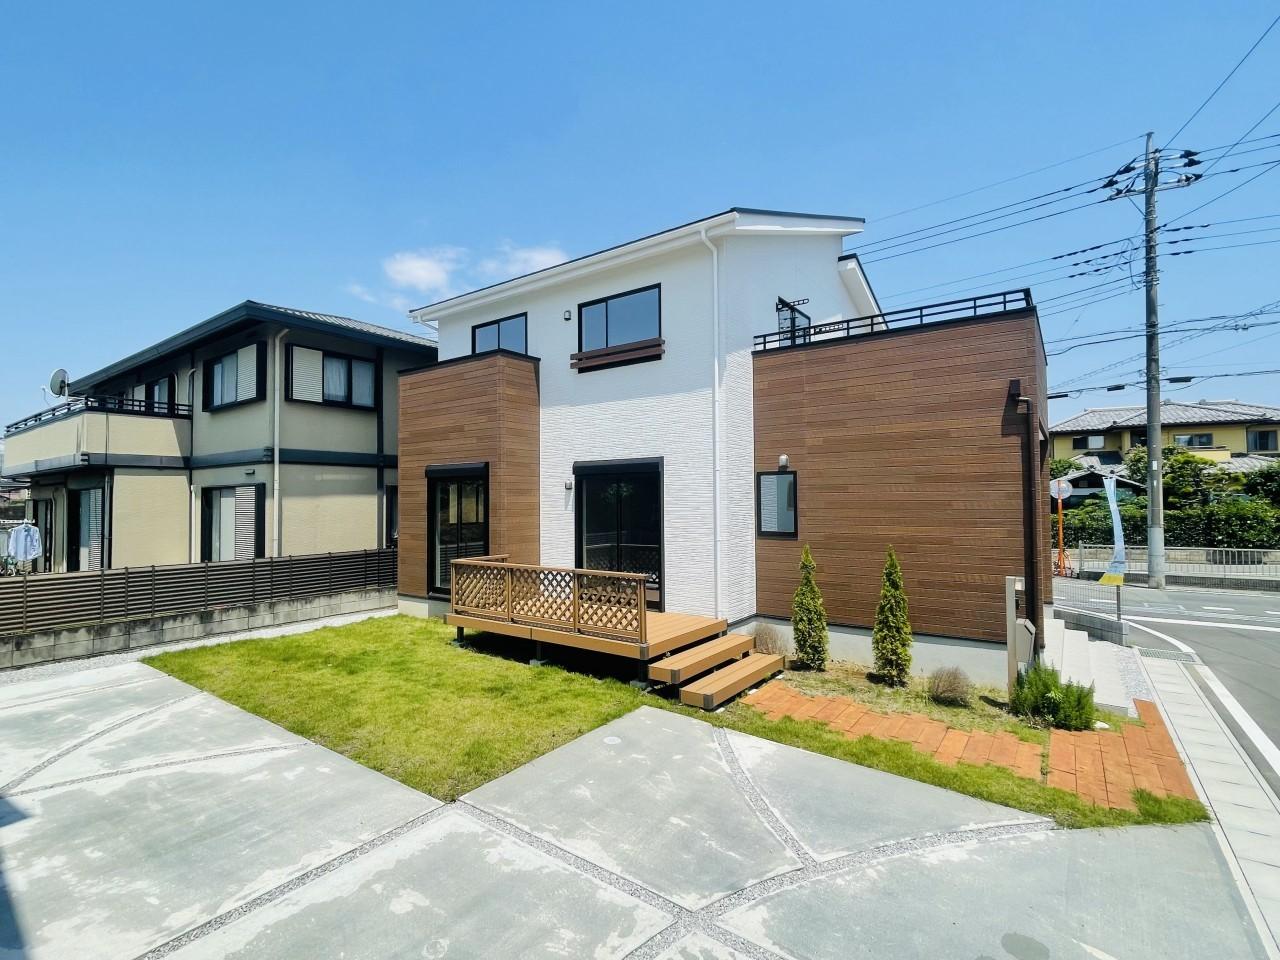 【KEIAI】 - FiT- 高崎市双葉町2期